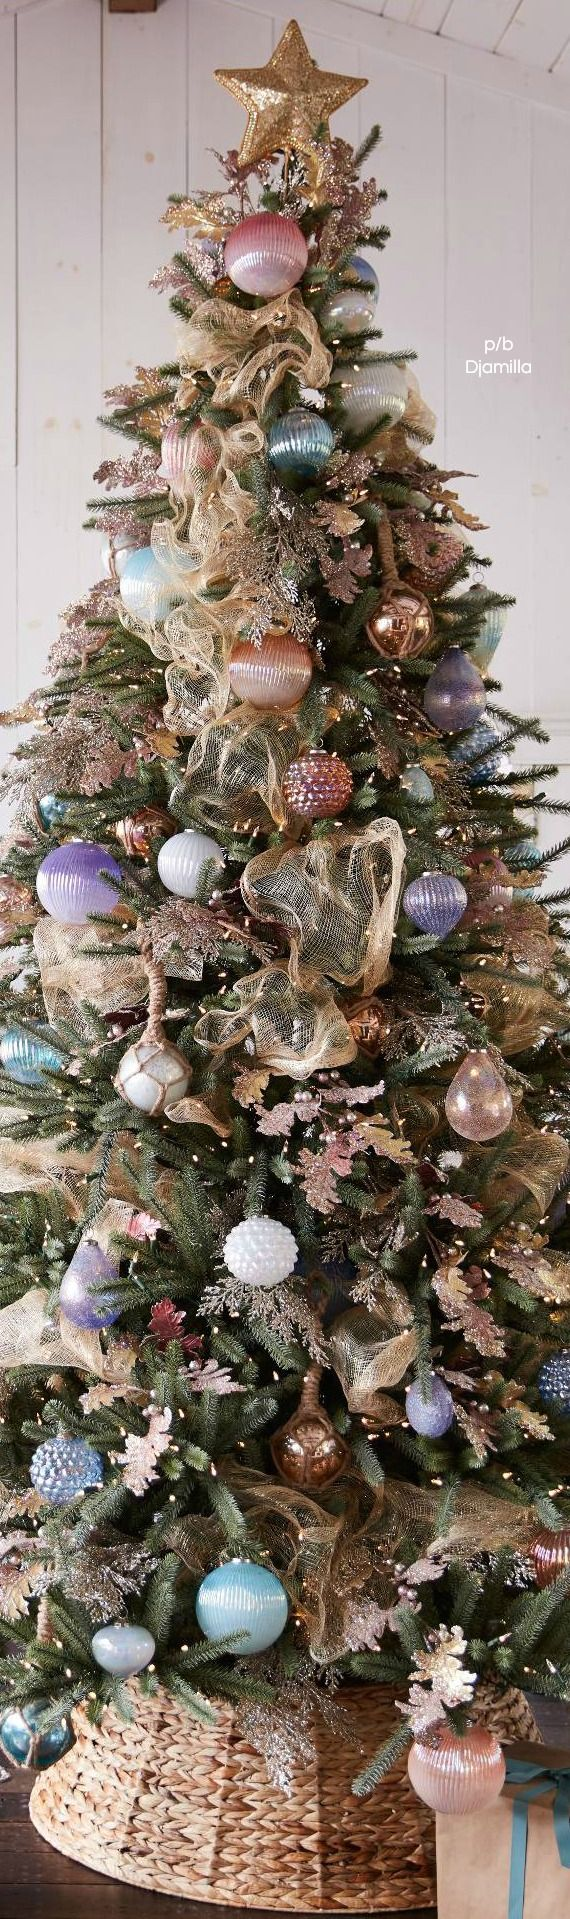 Christmas Tree Pastel Kmart Christmas Trees Beautiful Christmas Trees Christmas Ornament Sets